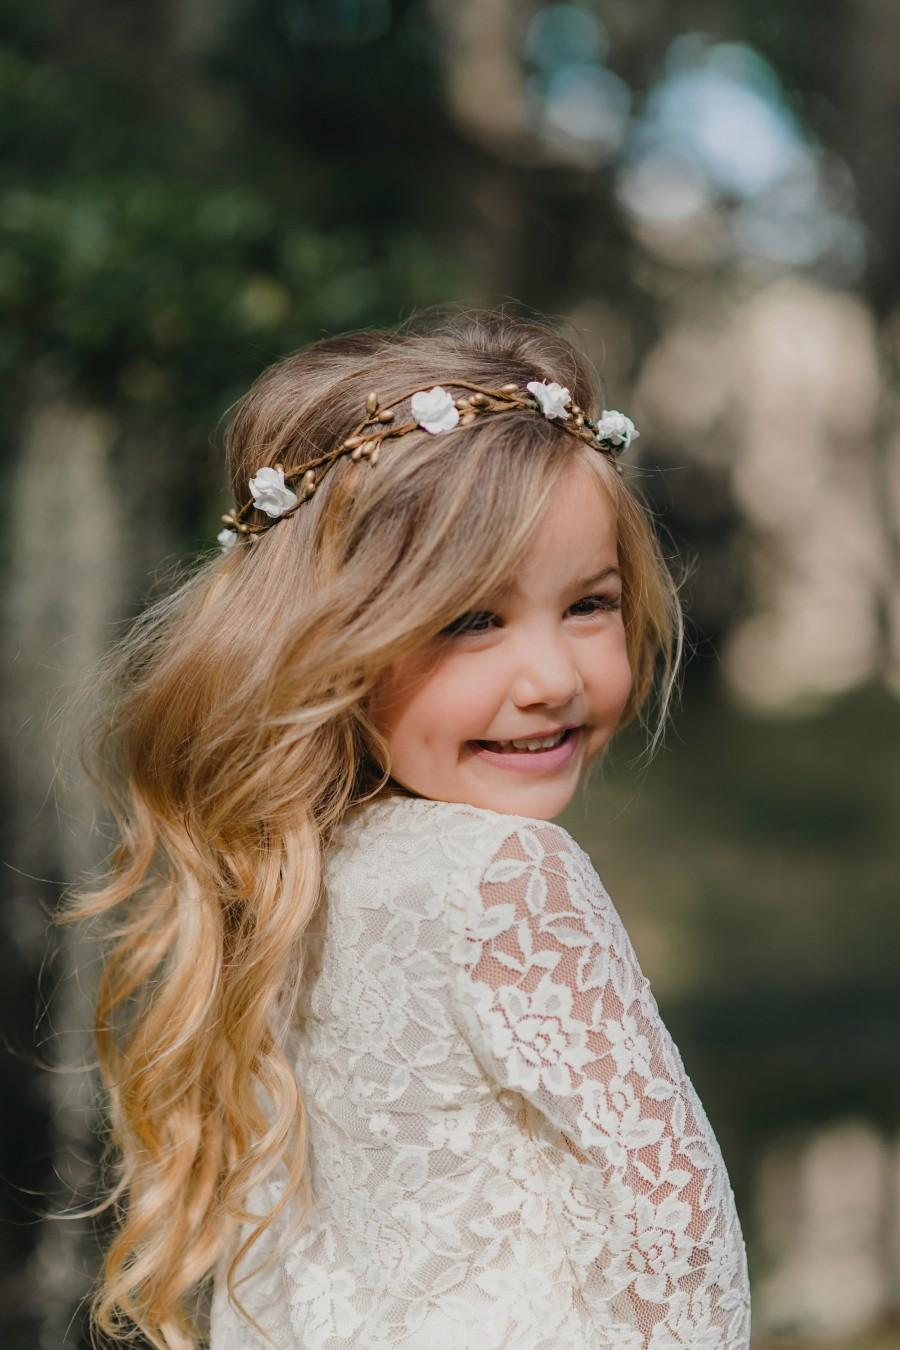 زفاف - Child Flower Crown - Flower Girl Flower Crown Wreath - Bridal Headpiece - Natural Wedding Hair Wreath - Gold Flower Crown